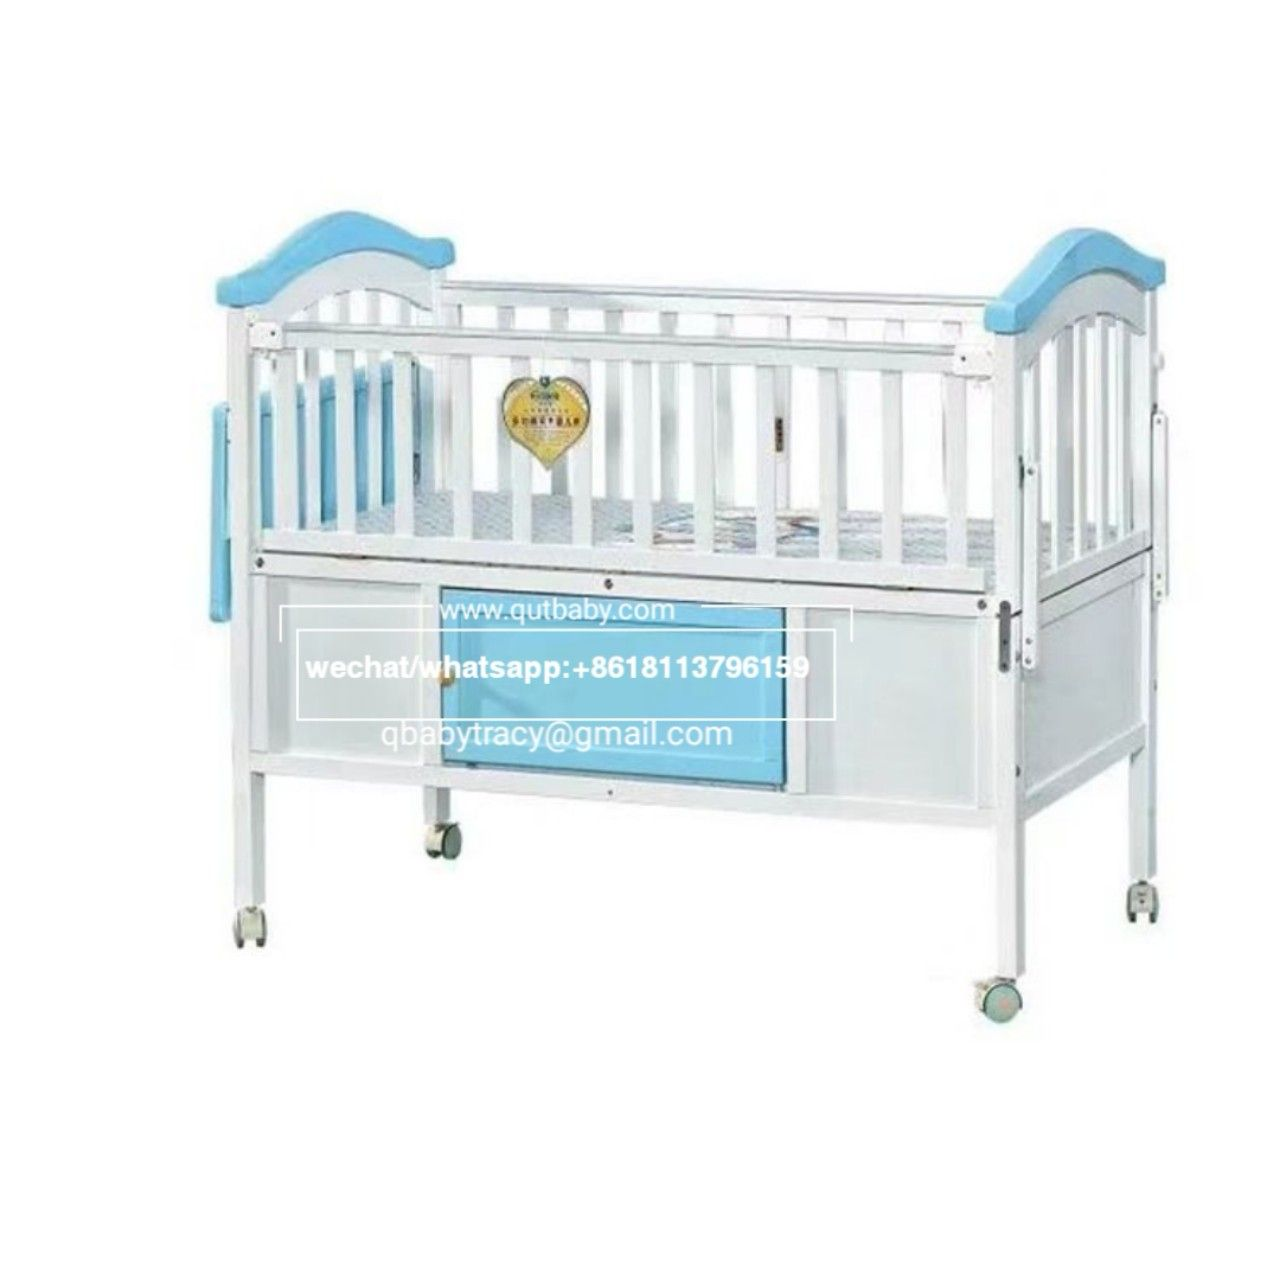 Baby Cot Crib Baby Crib Pine Wood Baby Bed Cambodia Hot Sale